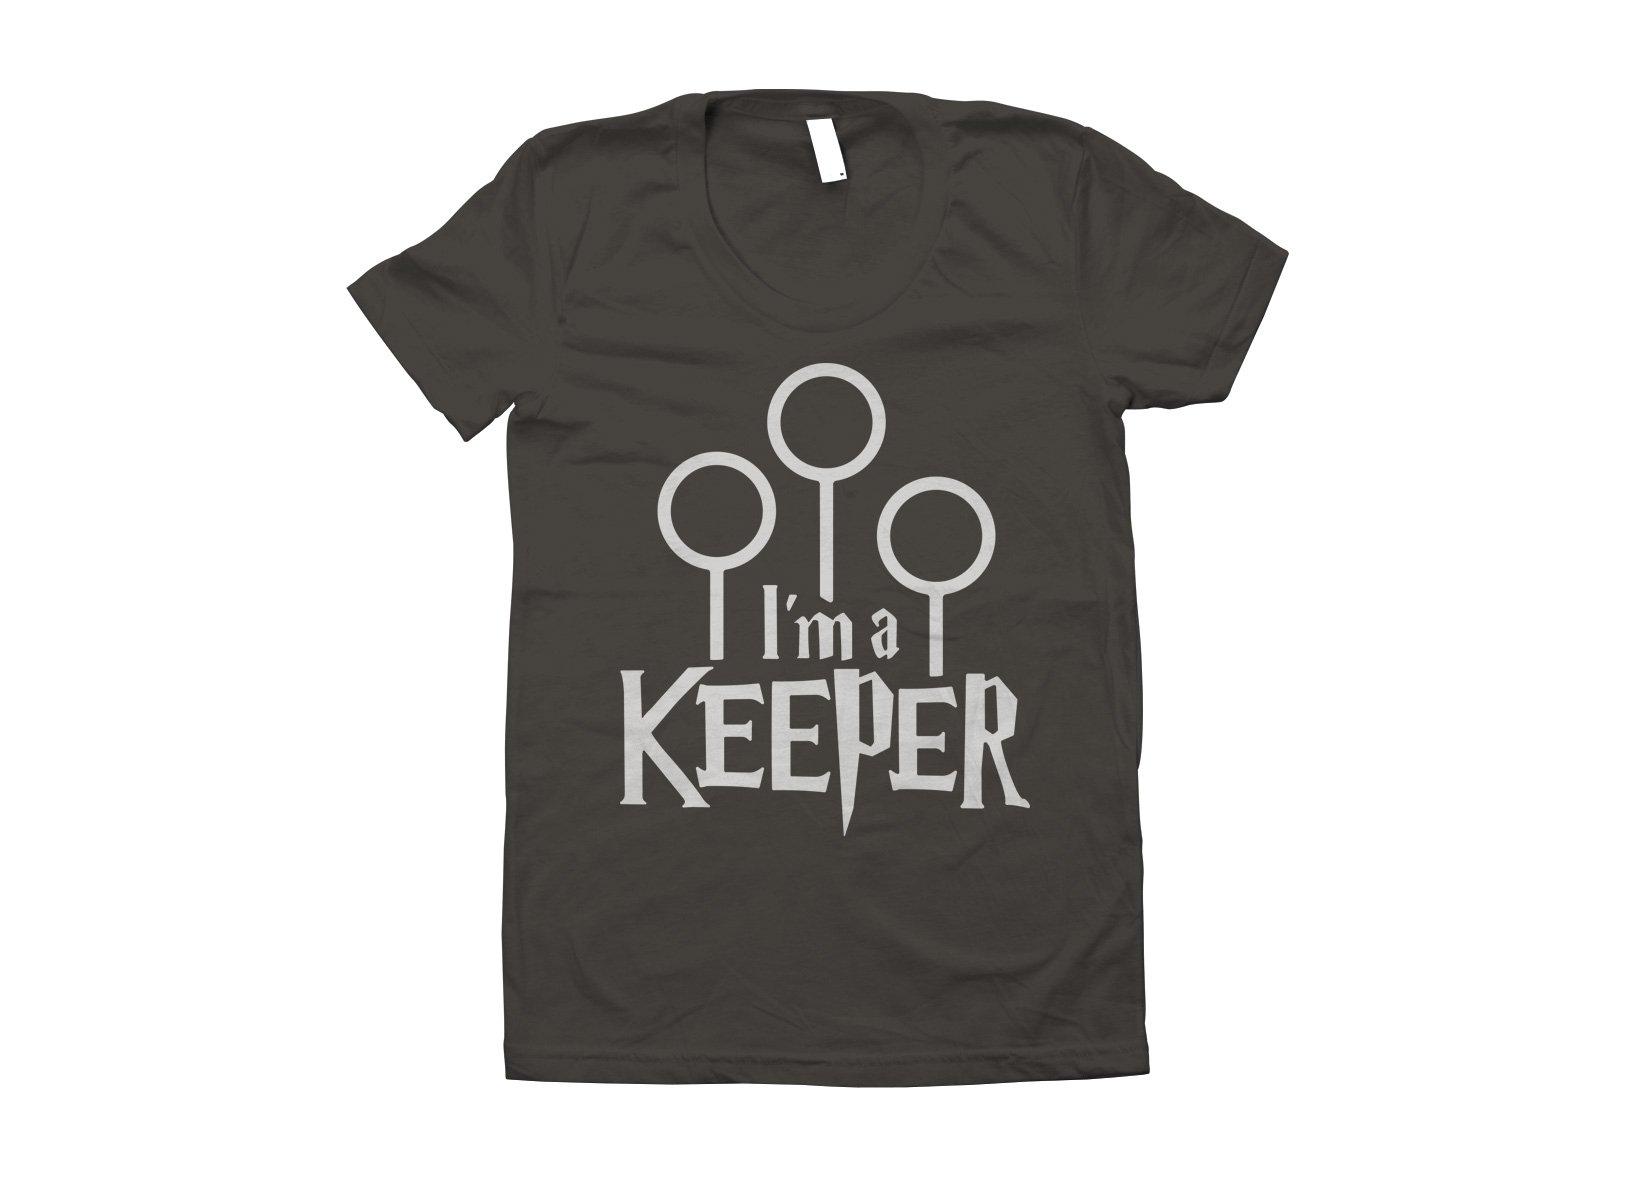 I'm A Keeper on Juniors T-Shirt